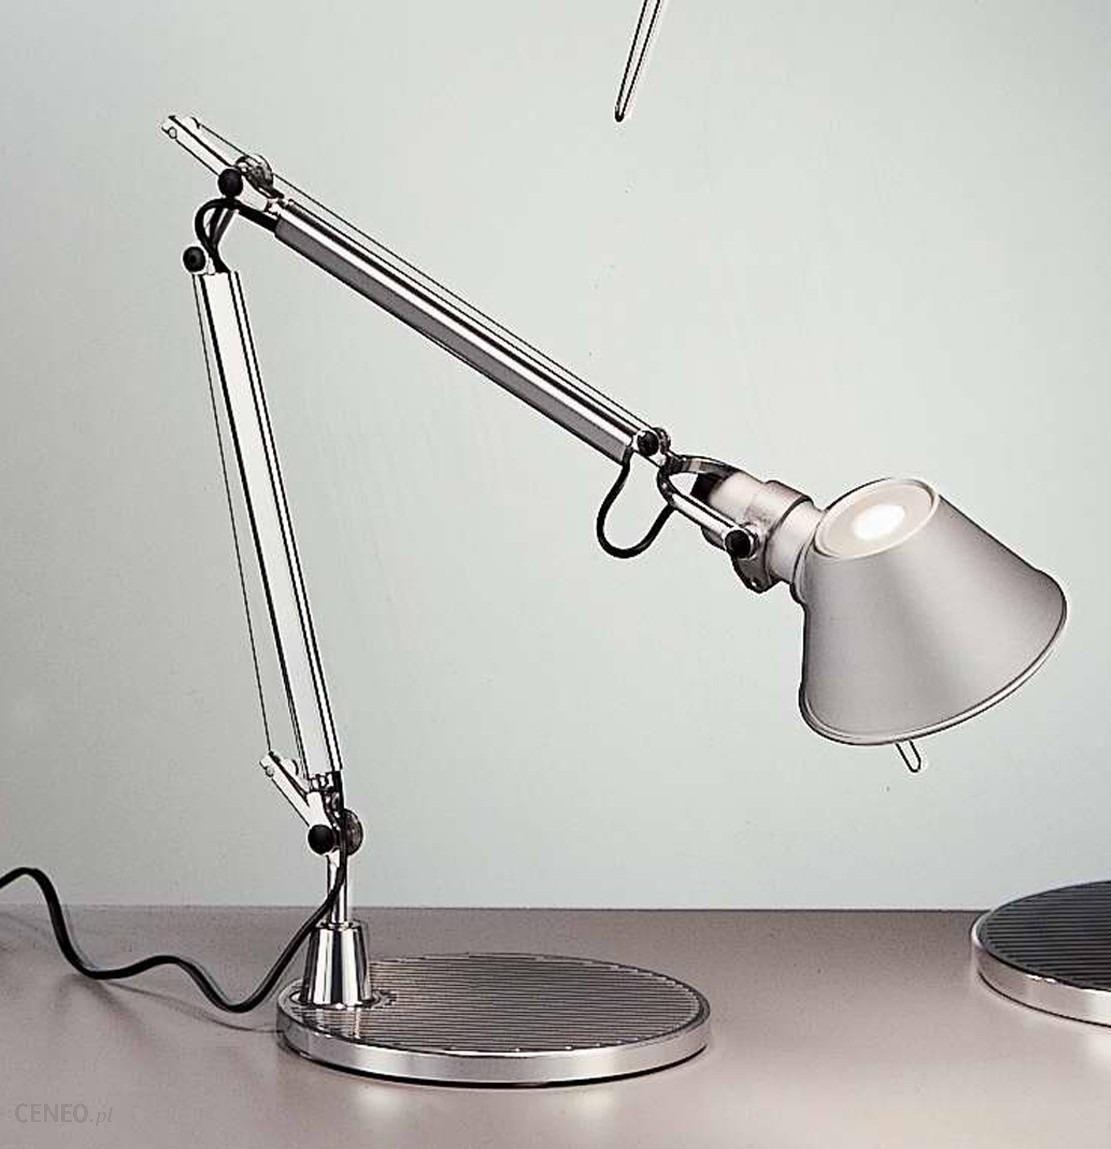 lampa sto owa artemide tolomeo micro led materia y podstawa i struktura z ruchomymi ramionami. Black Bedroom Furniture Sets. Home Design Ideas